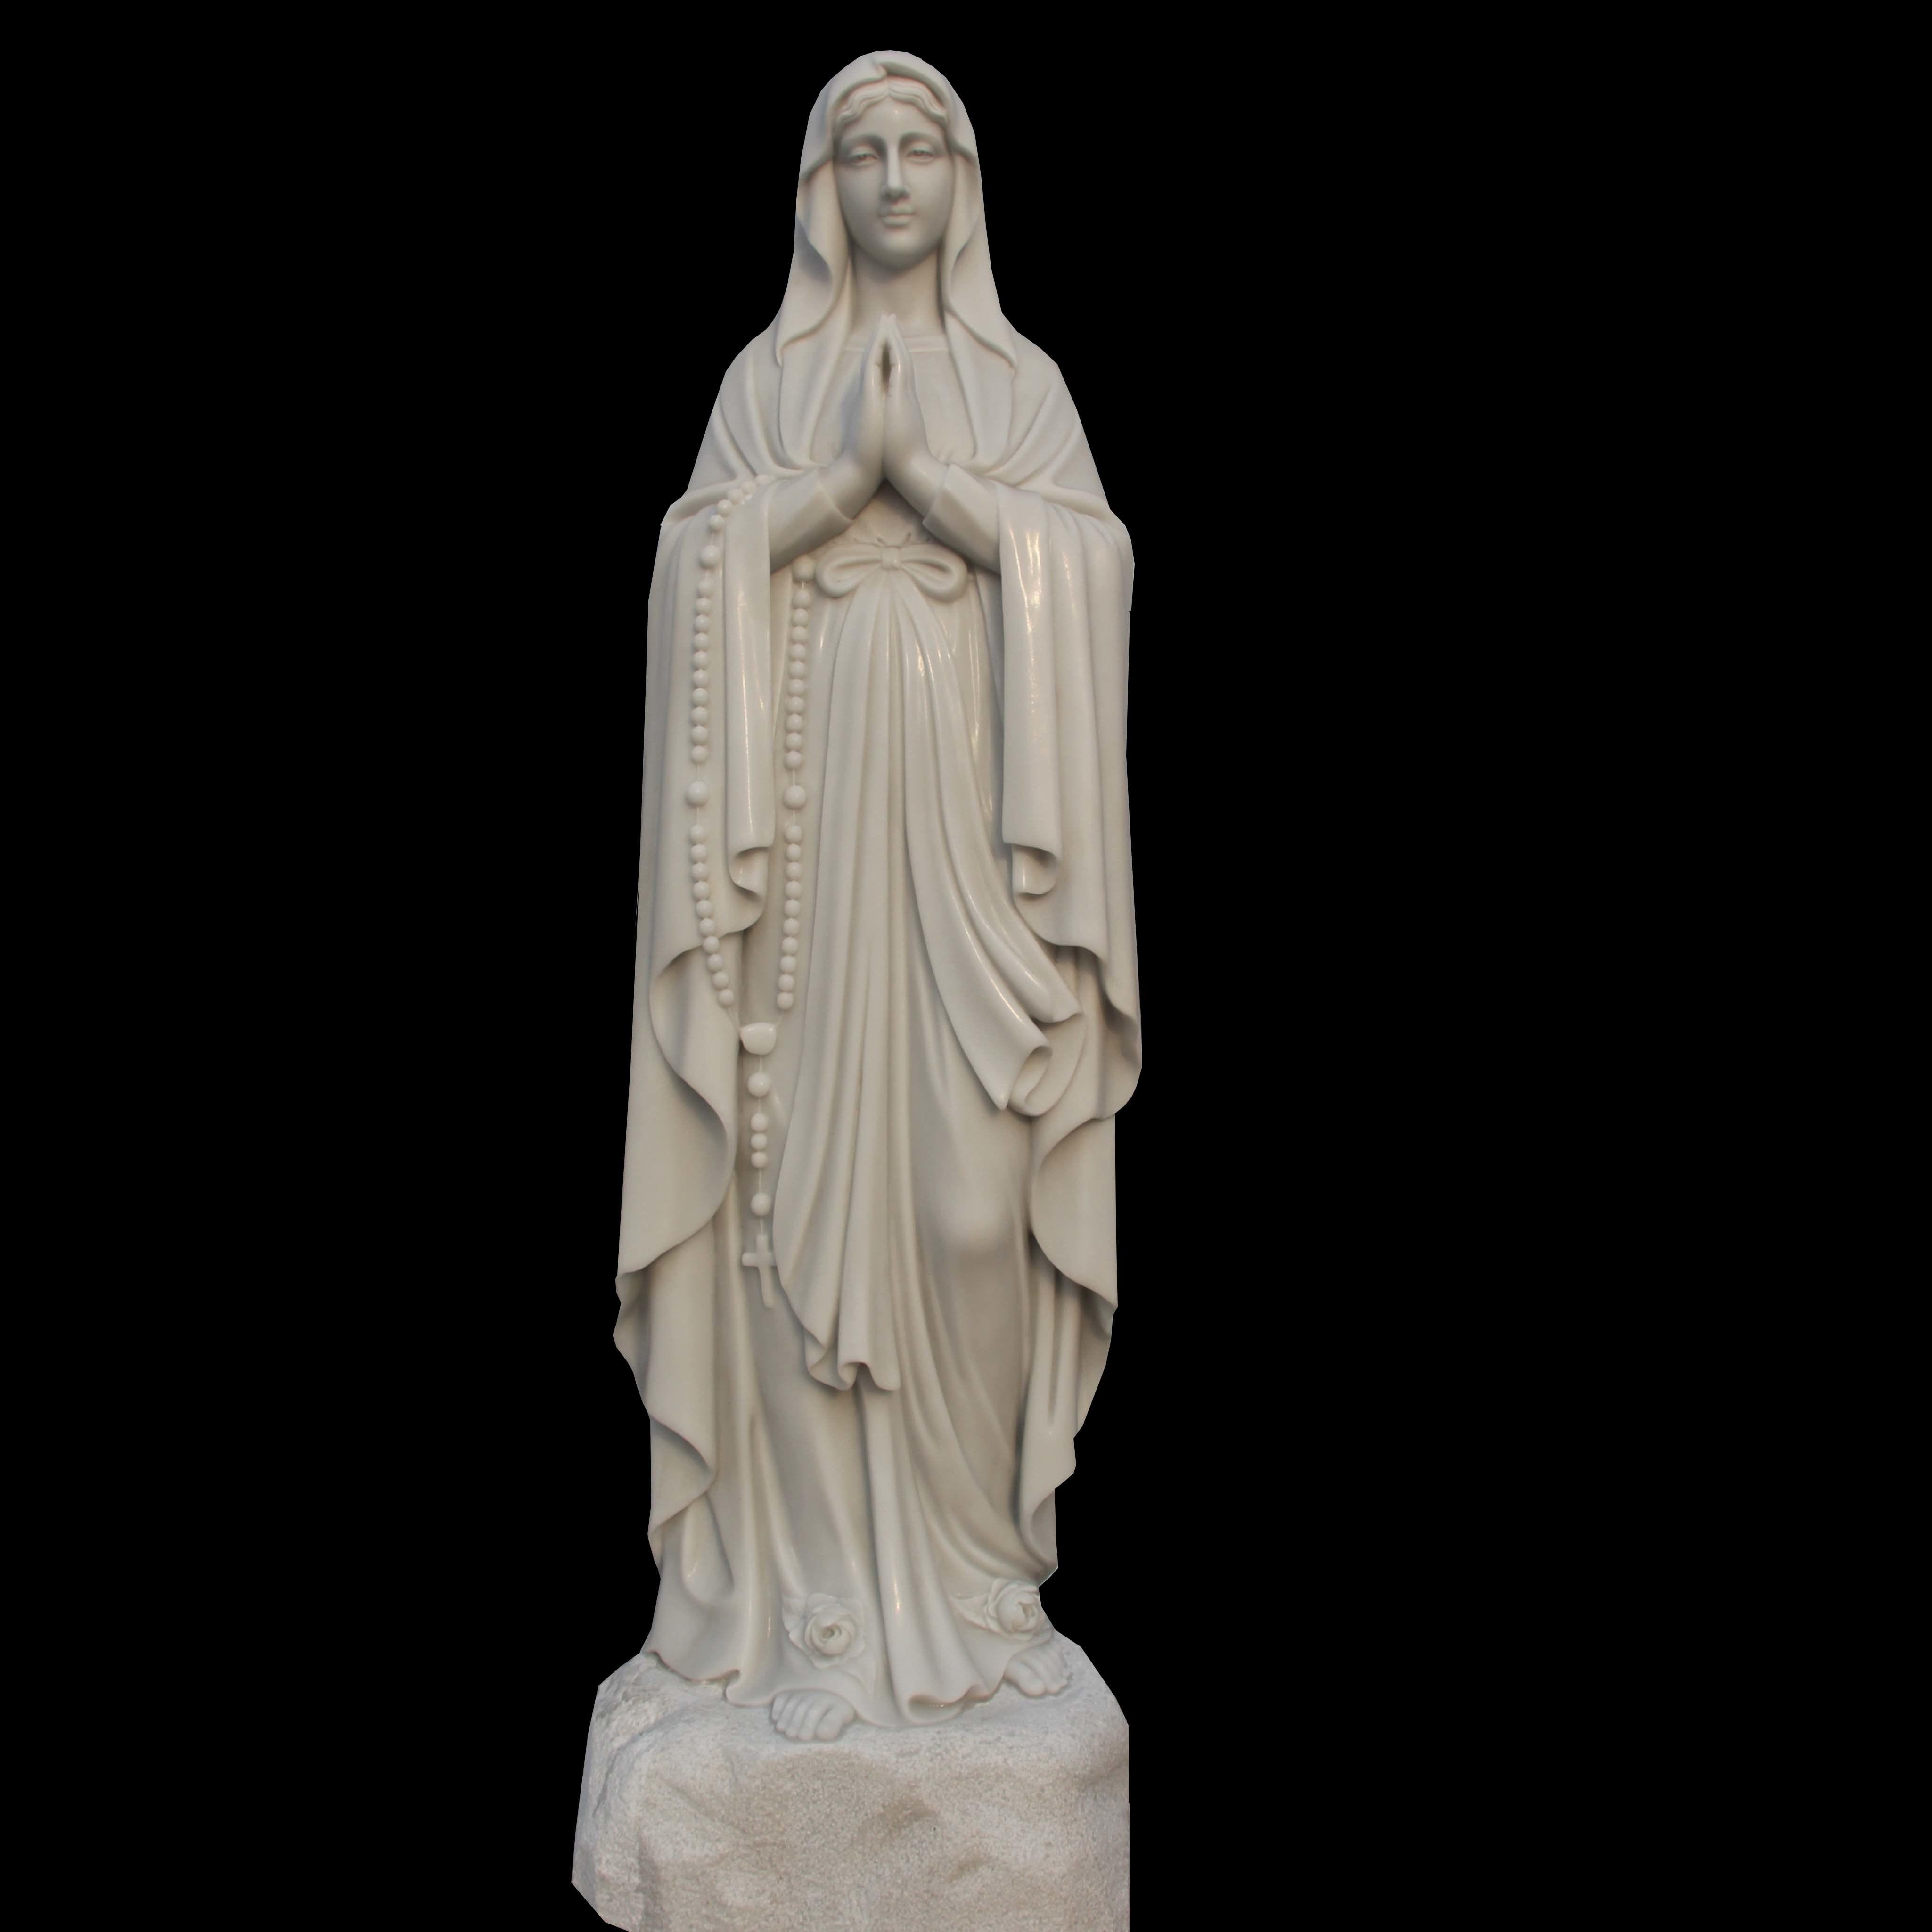 Church Sculpture Maria Statue Stt048